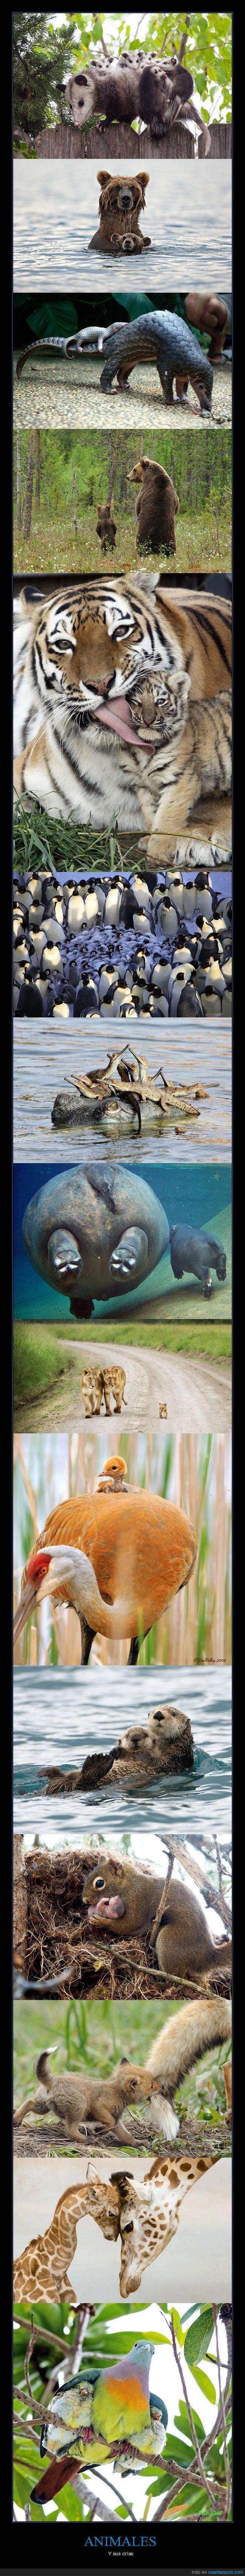 animales,crías